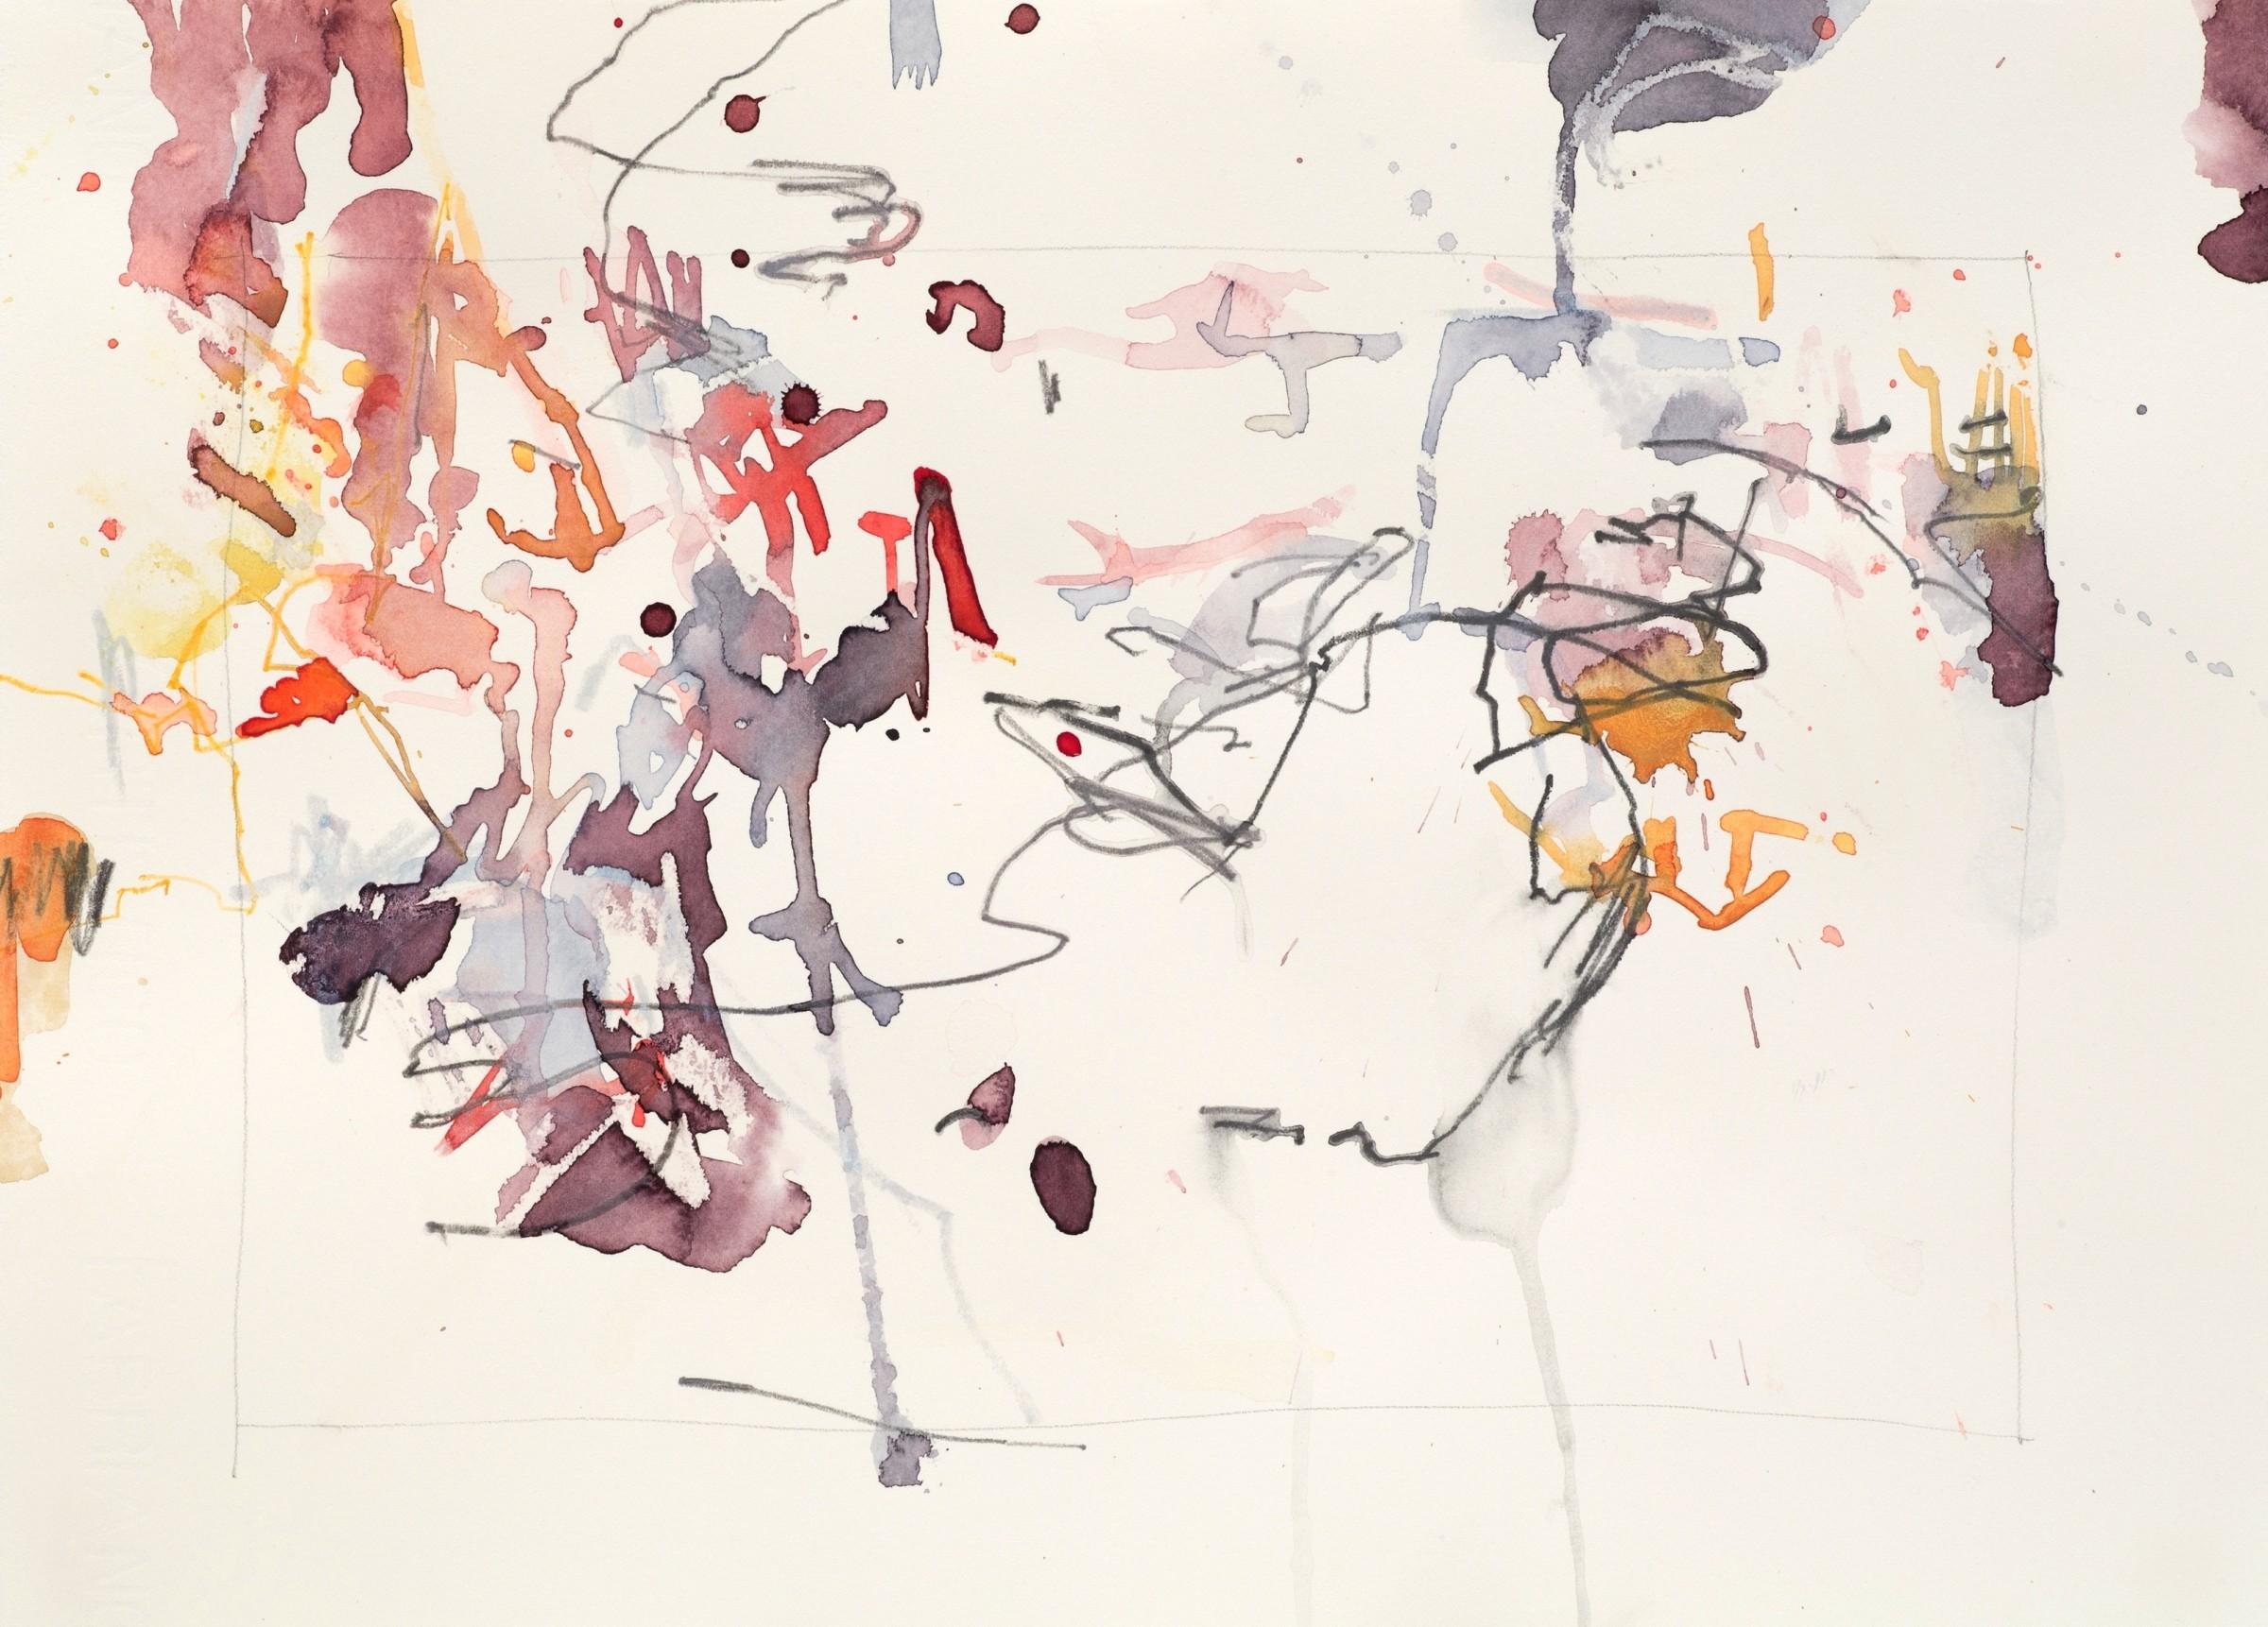 <span class=&#34;link fancybox-details-link&#34;><a href=&#34;/exhibitions/16/works/image_standalone392/&#34;>View Detail Page</a></span><p>Peter Esslemont,&#160;<em>Paraphrase</em>, &#163;395</p>